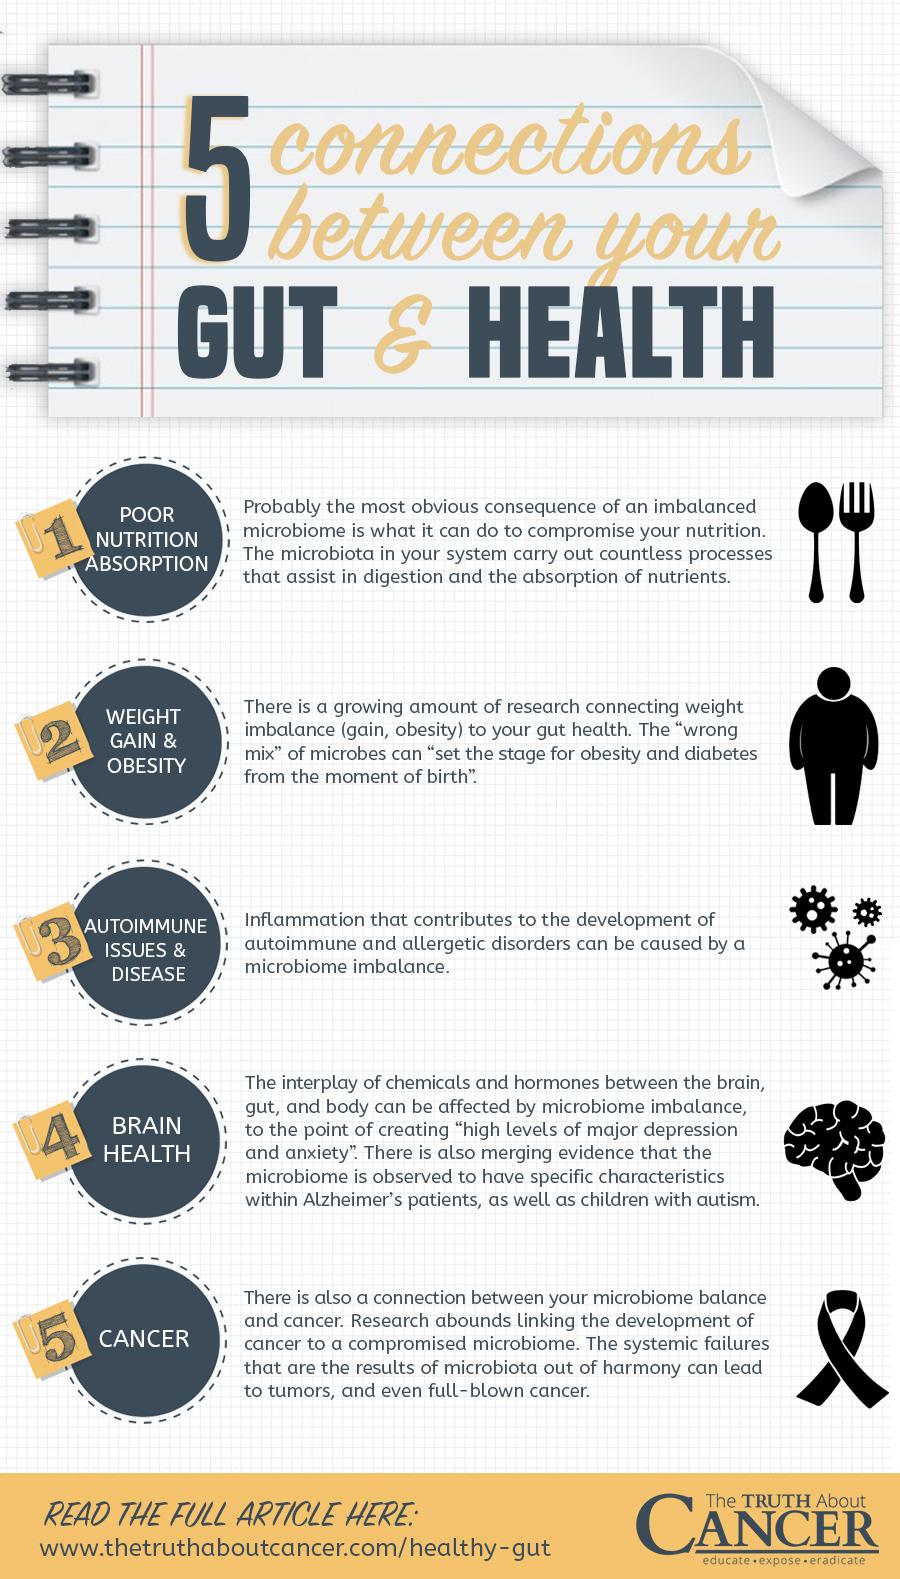 Imbalanced-gut-health-cancer